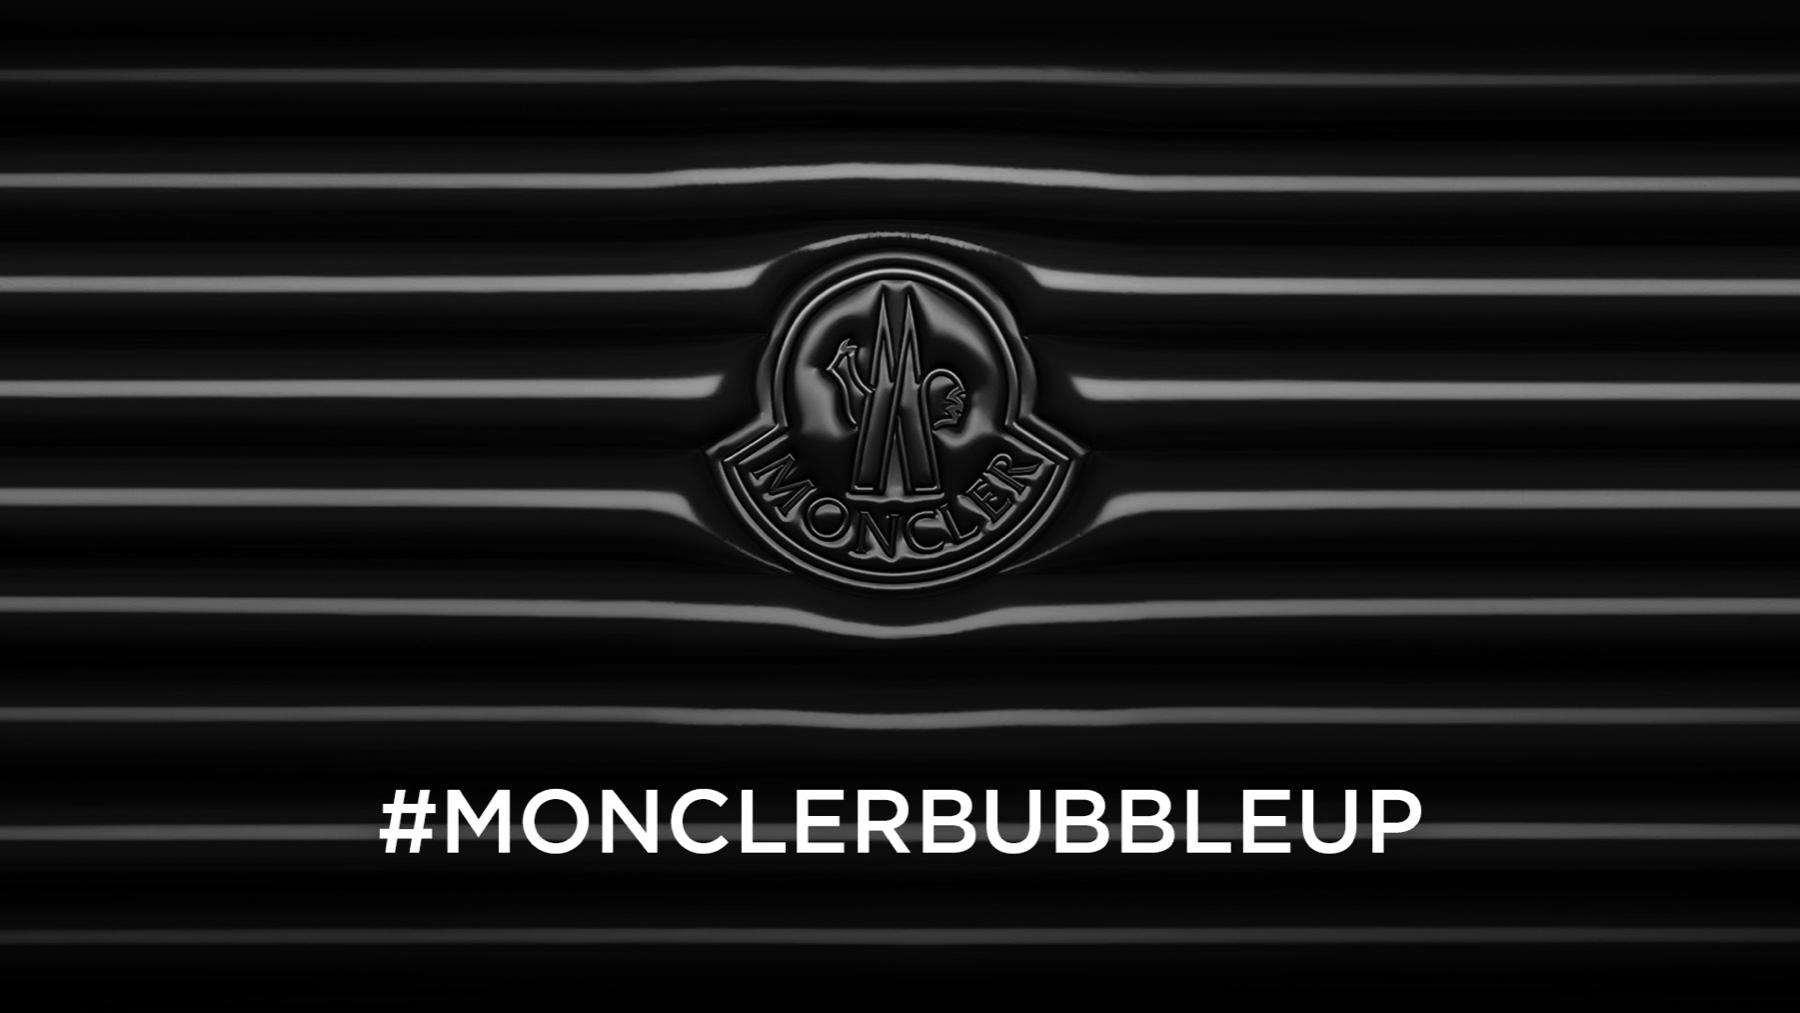 MonclerBubbleUp Challenge